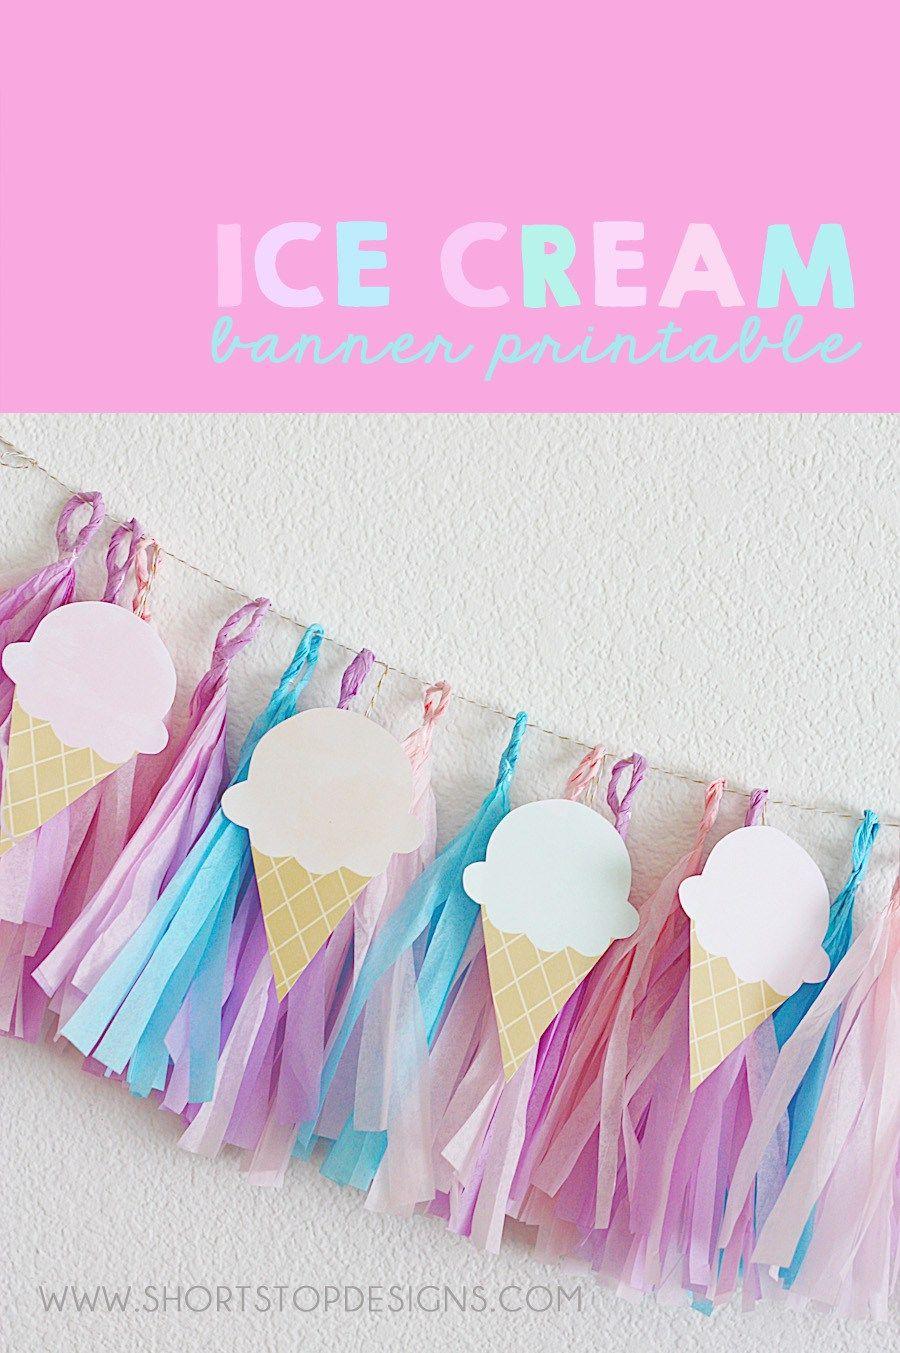 Photo of Ice Cream Transparent Printable